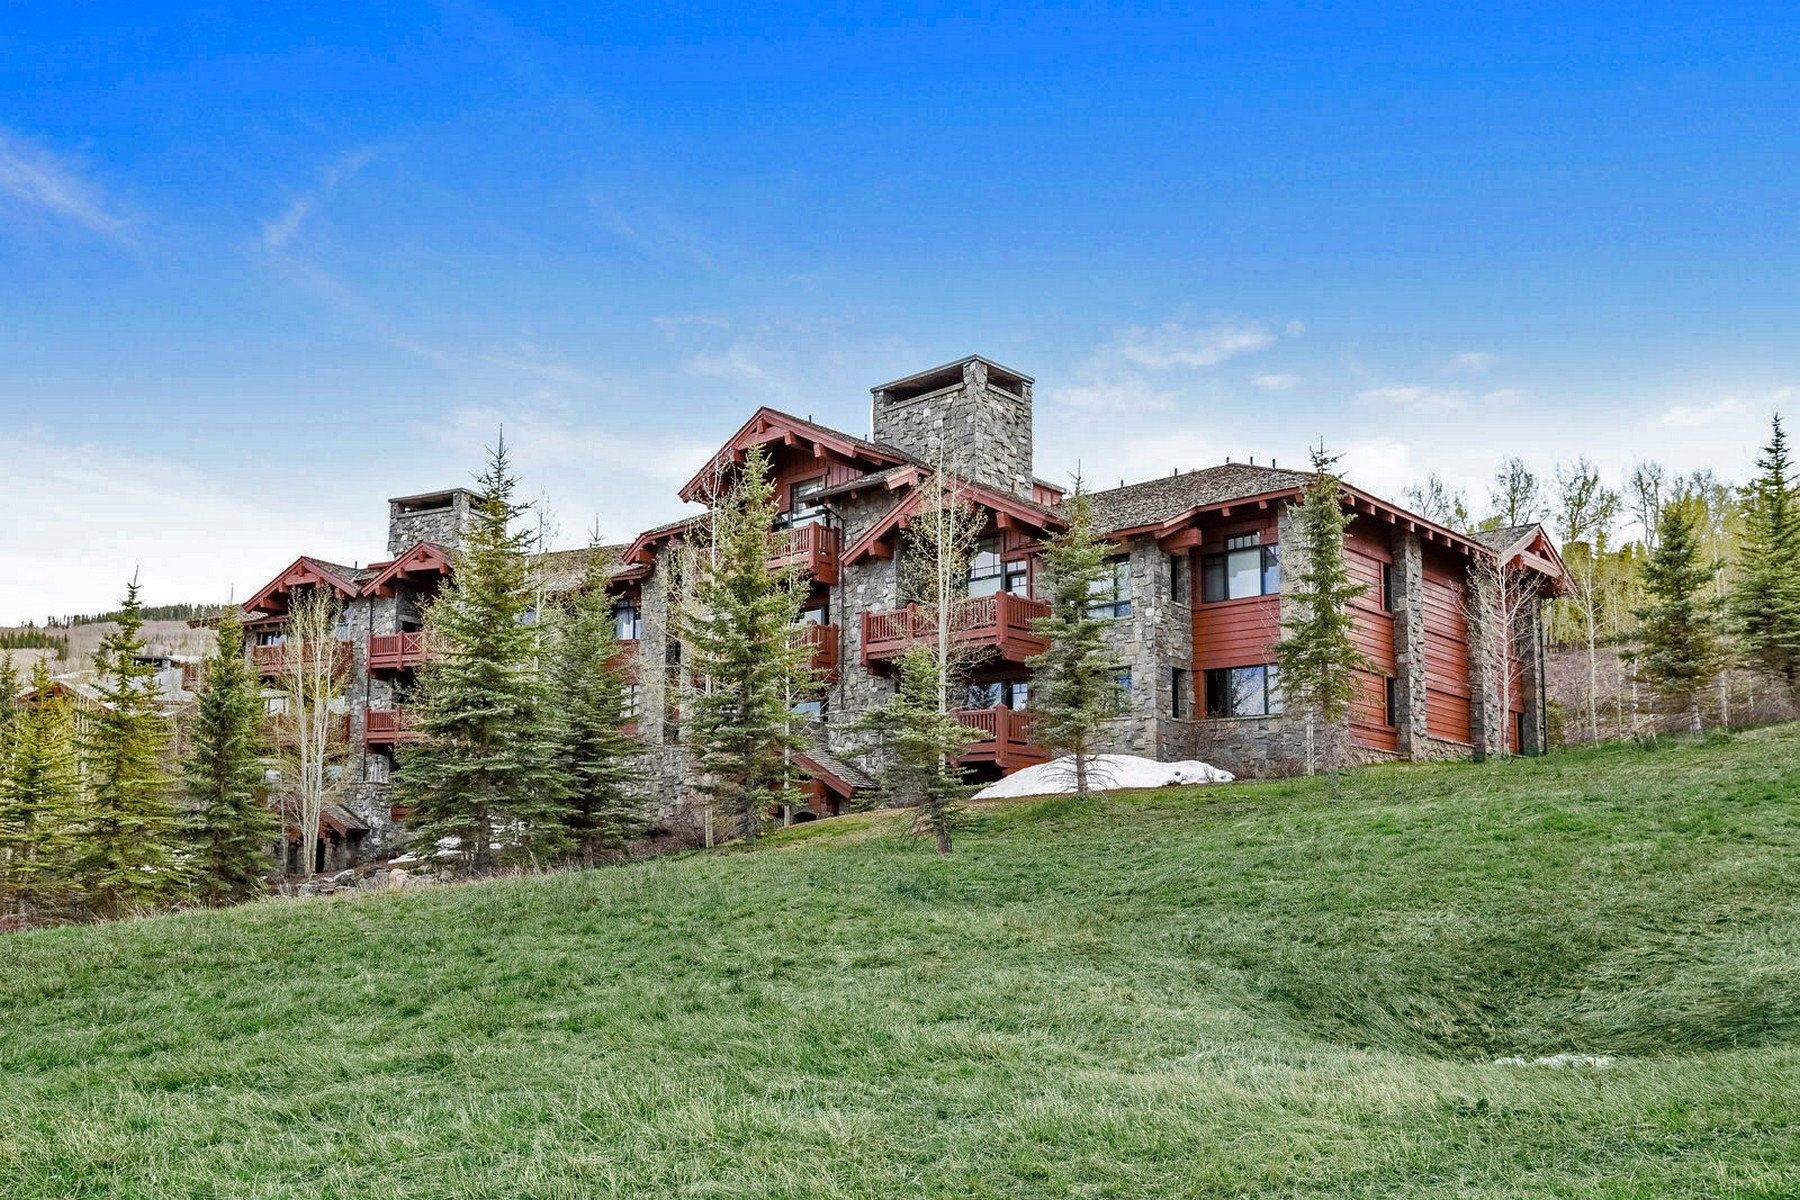 Condominiums for Active at The Hummingbird Lodge #B102 335 Hummingbird #B102 Avon, Colorado 81620 United States